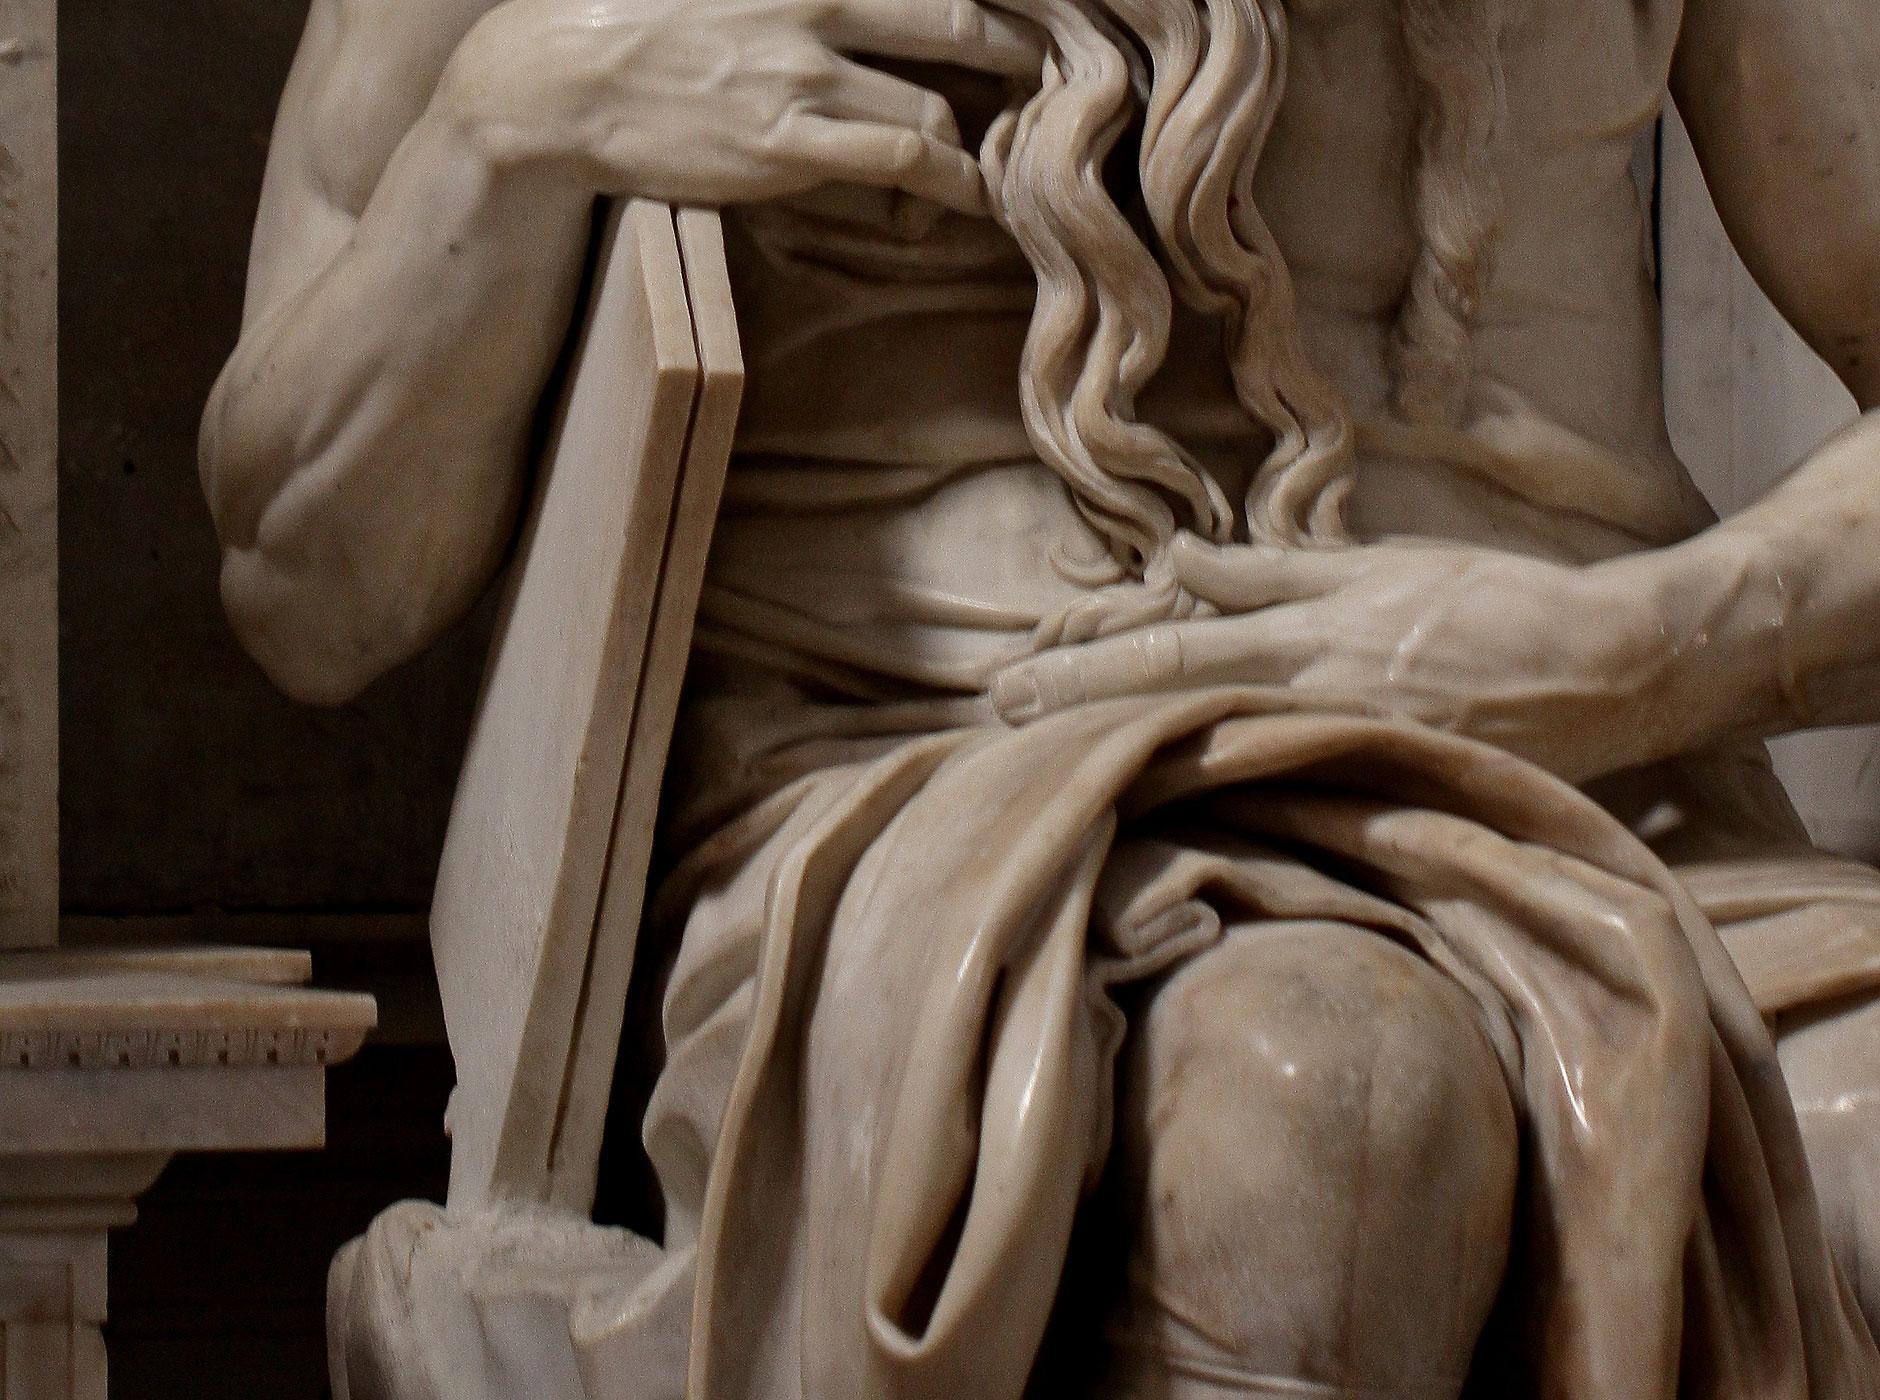 Michelangelo Buonarroti, Mosè, dettaglio delle tavole. Ph. Credit Jörg Bittner Unna